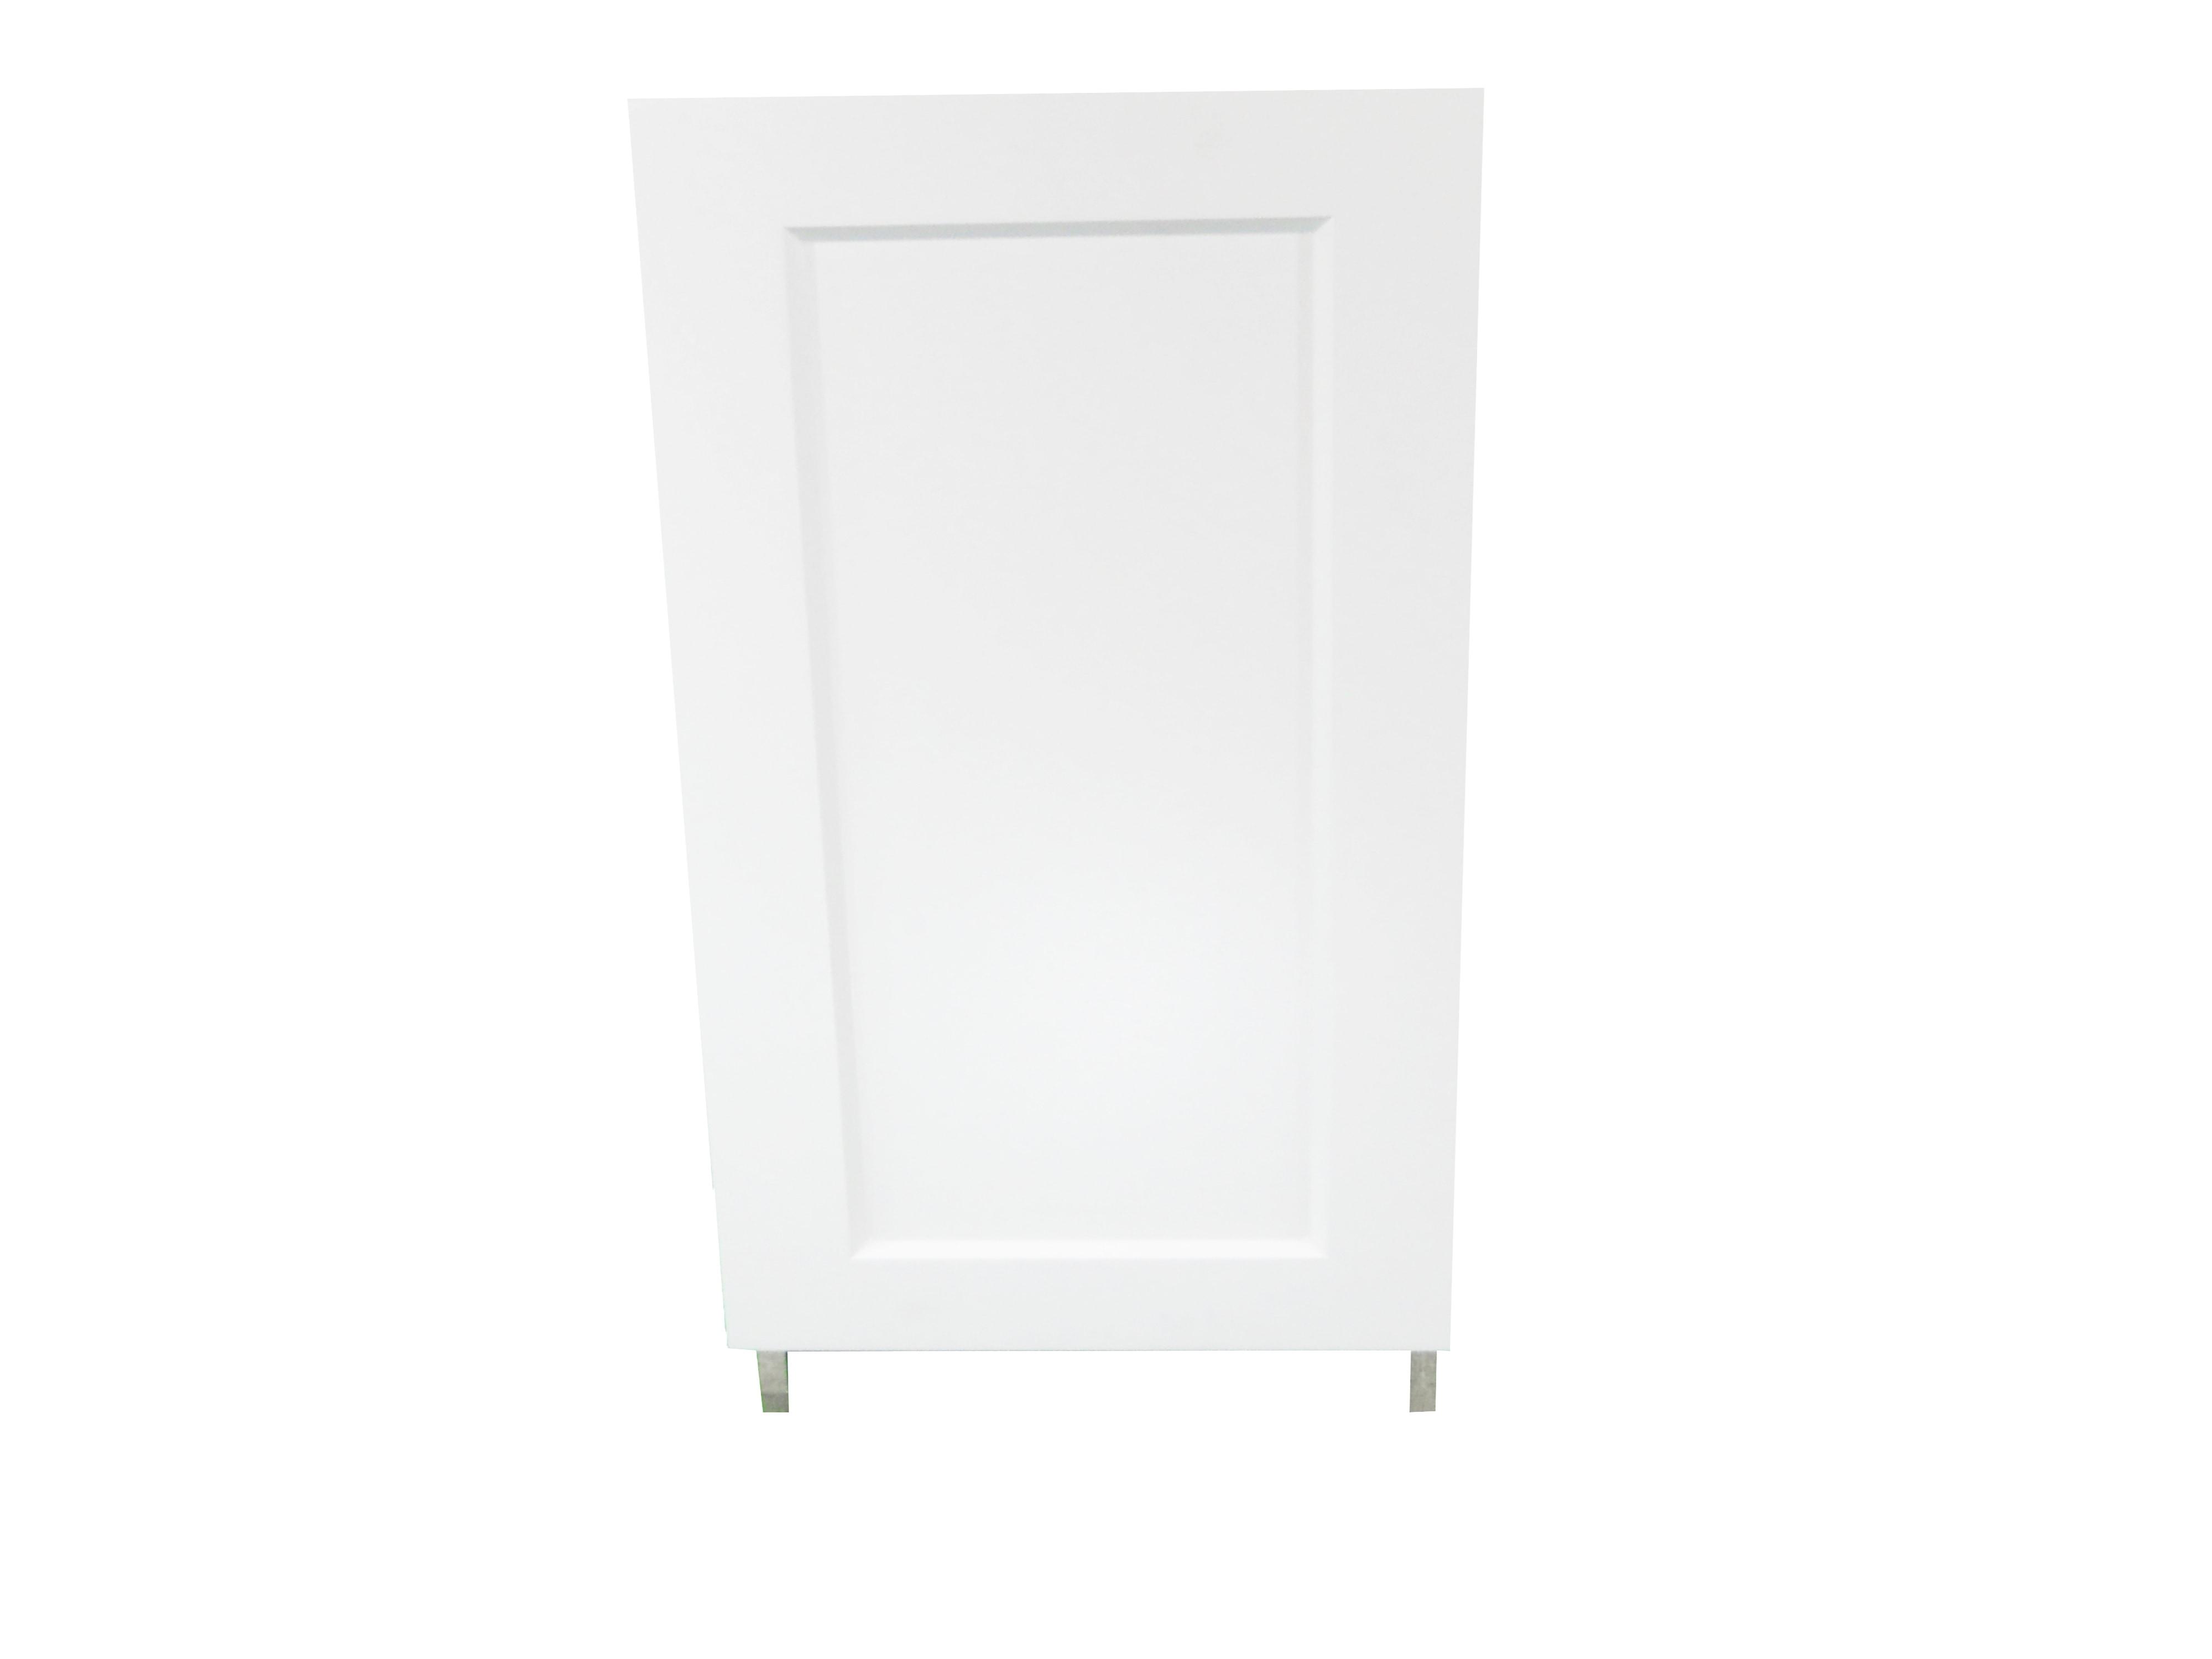 Base Cabinet With Door / Wistler White / Flat Panel White / 21 Whistler White 0